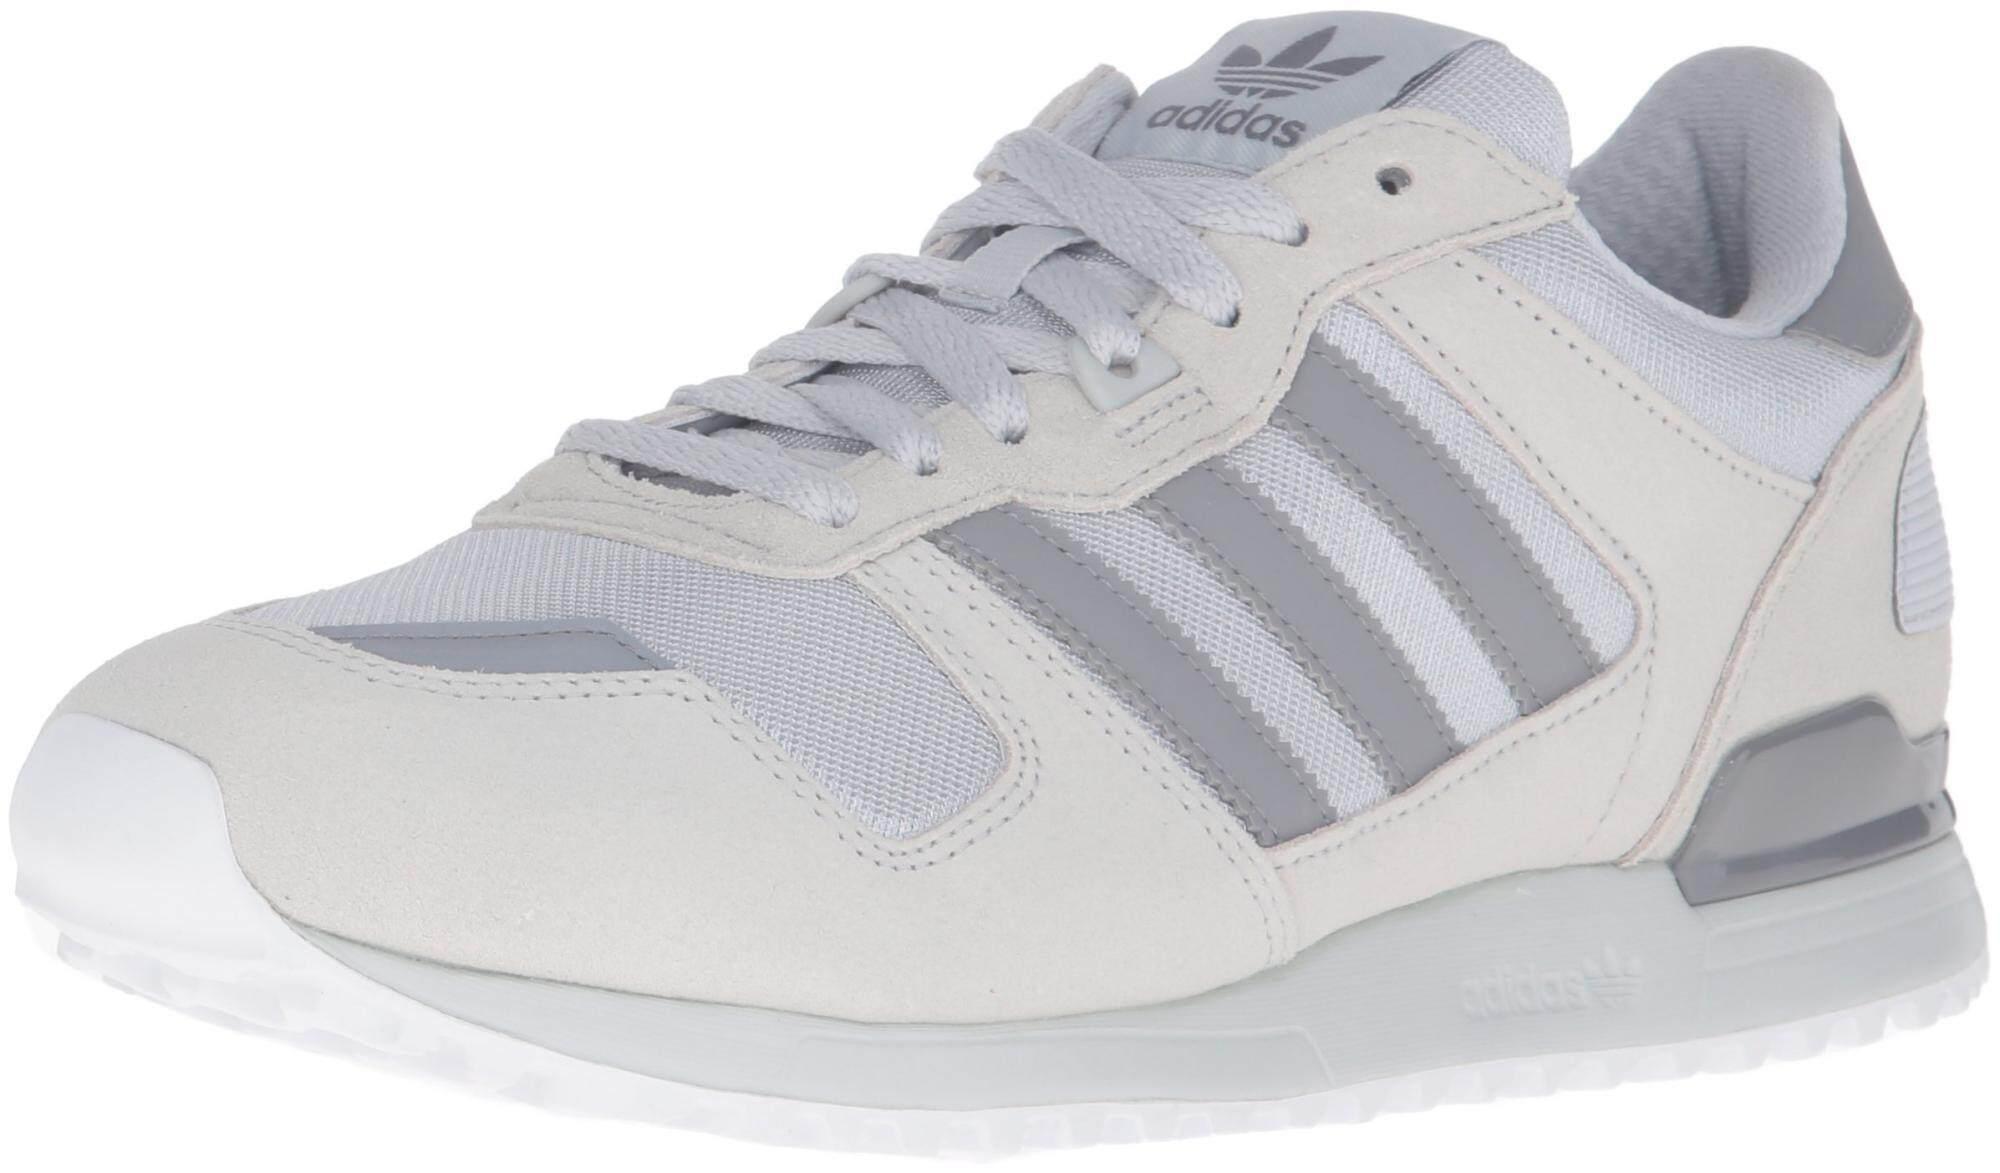 adidas-originals-men39s-zx-700-fashion-sneaker-clear-onixtech-grey-f12white-11-m-us-2708-95233423-6e0e841fb1e1f8d715f1fcff3ee4d785- Kumpulan List Harga Sepatu Adidas Zx 700 Terbaru waktu ini